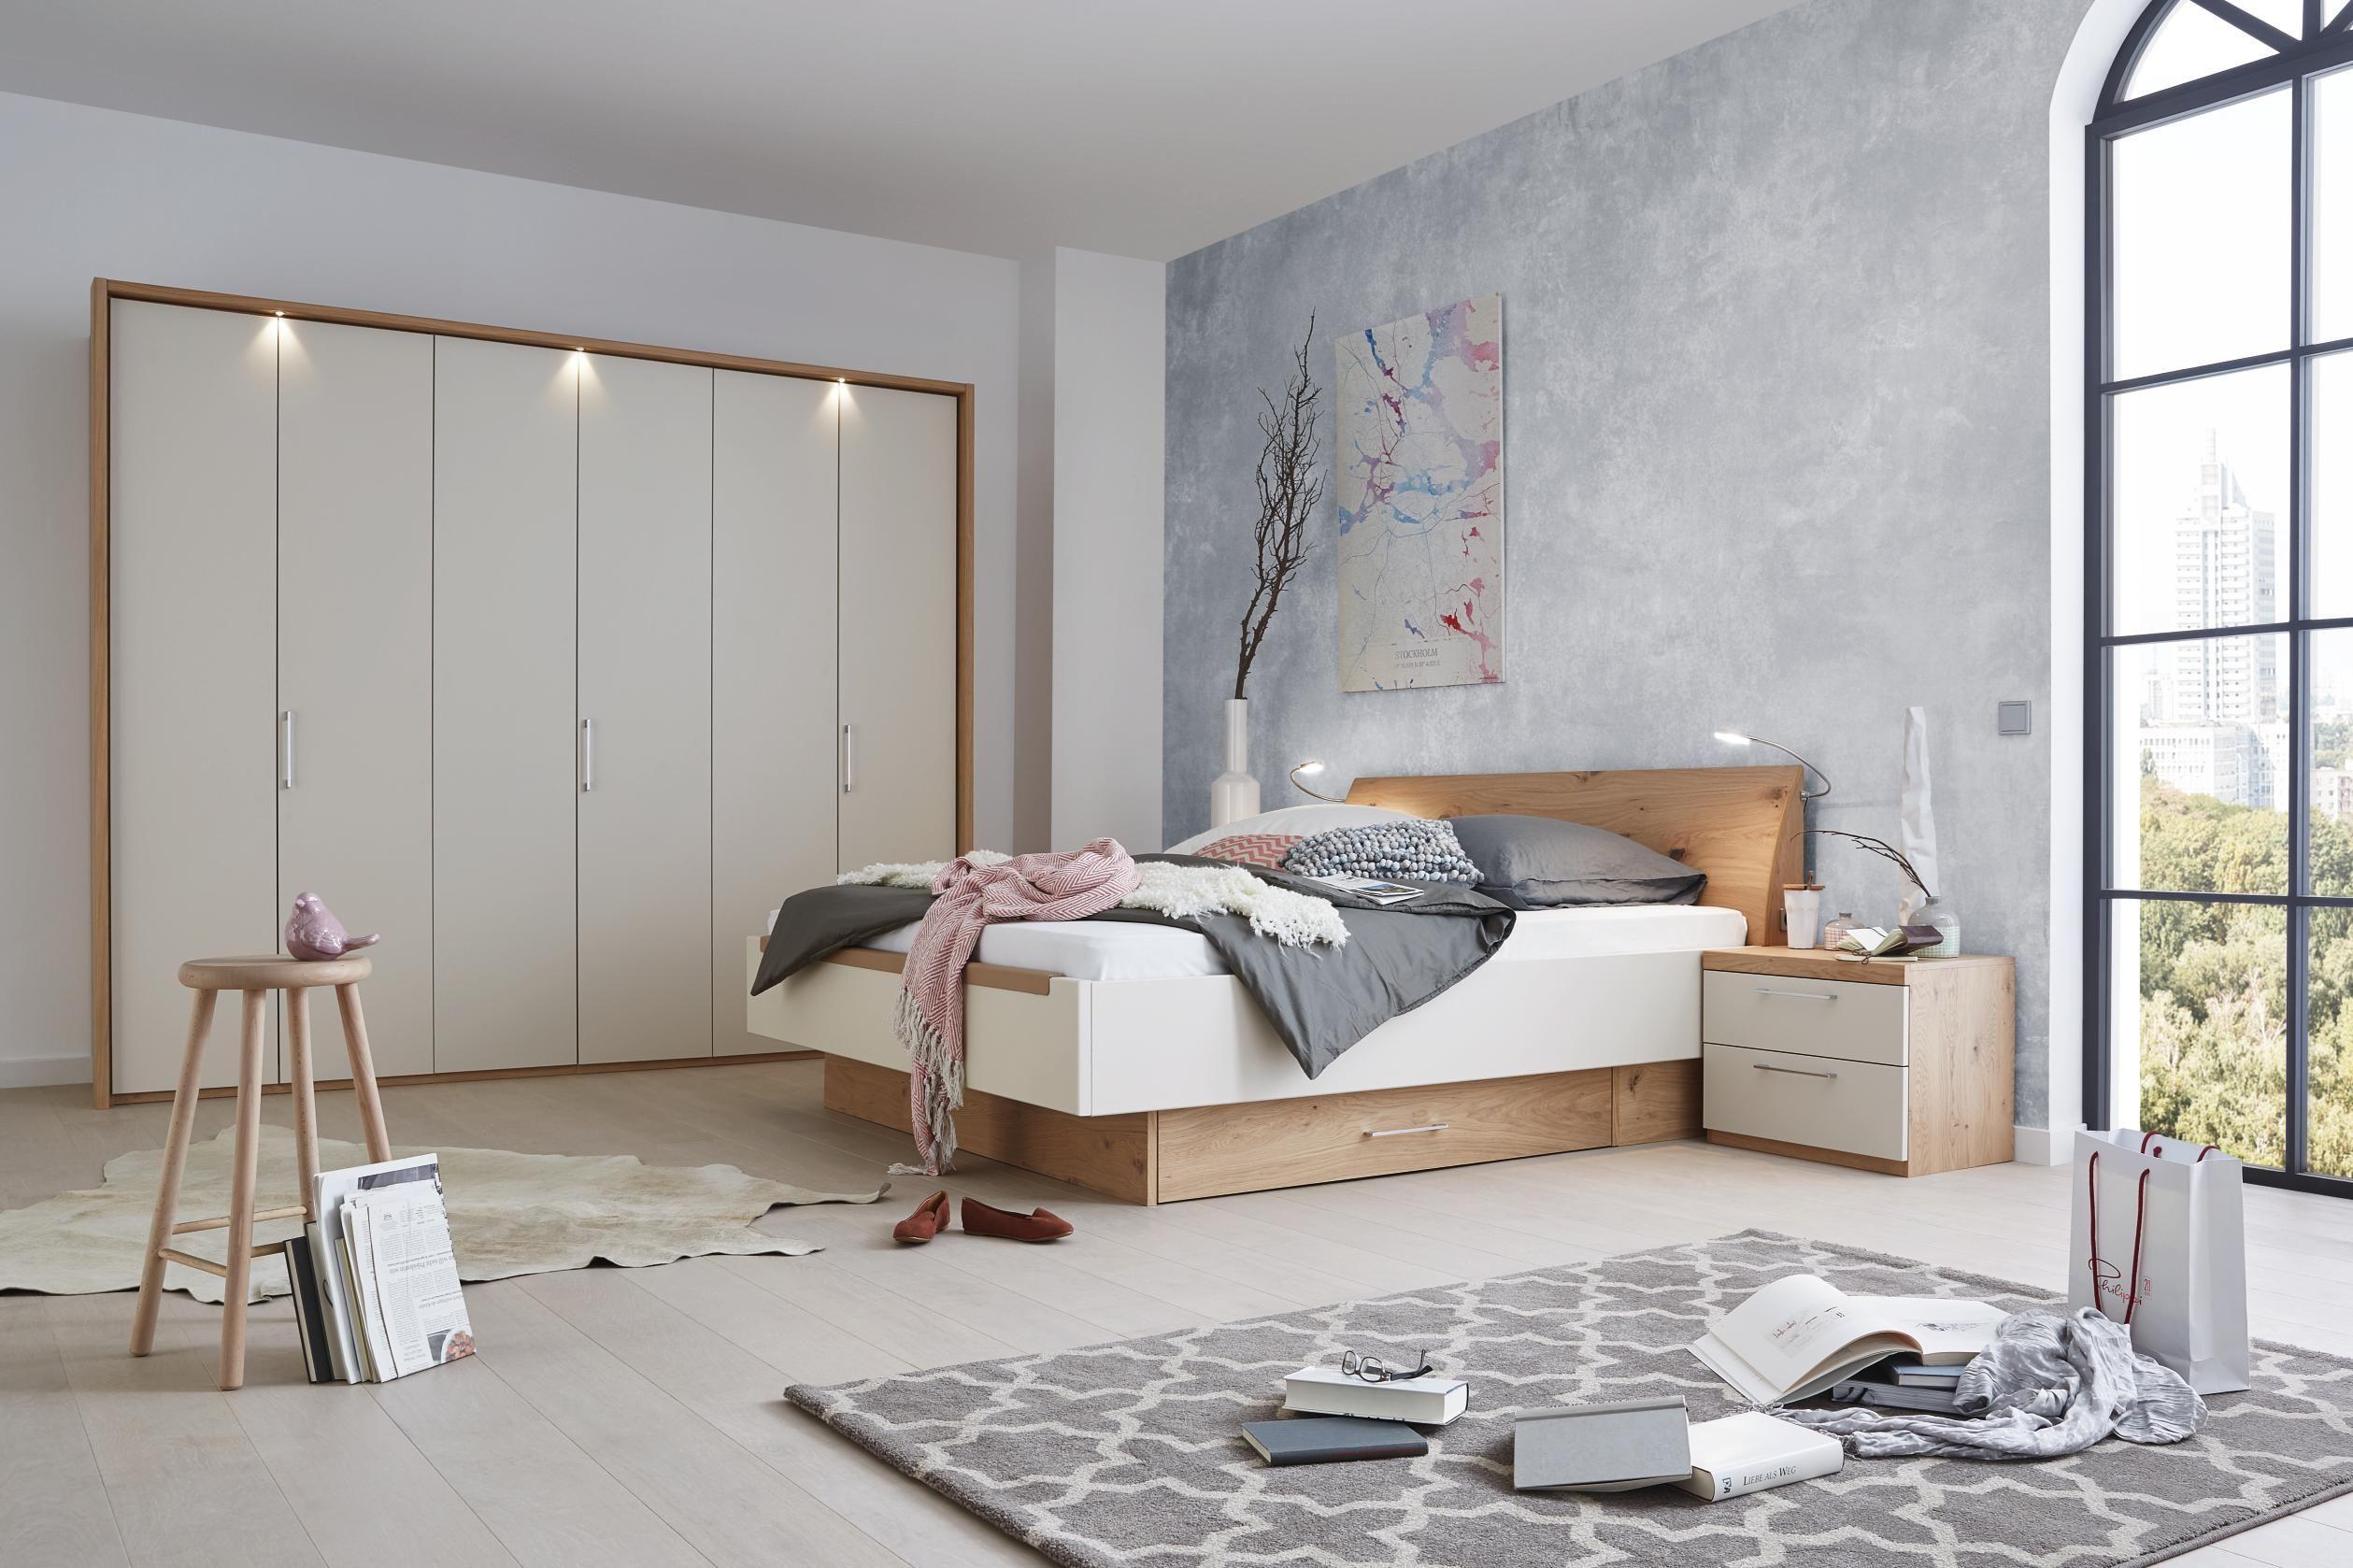 Dieter Knoll Collection Schlafzimmer | Pinterest